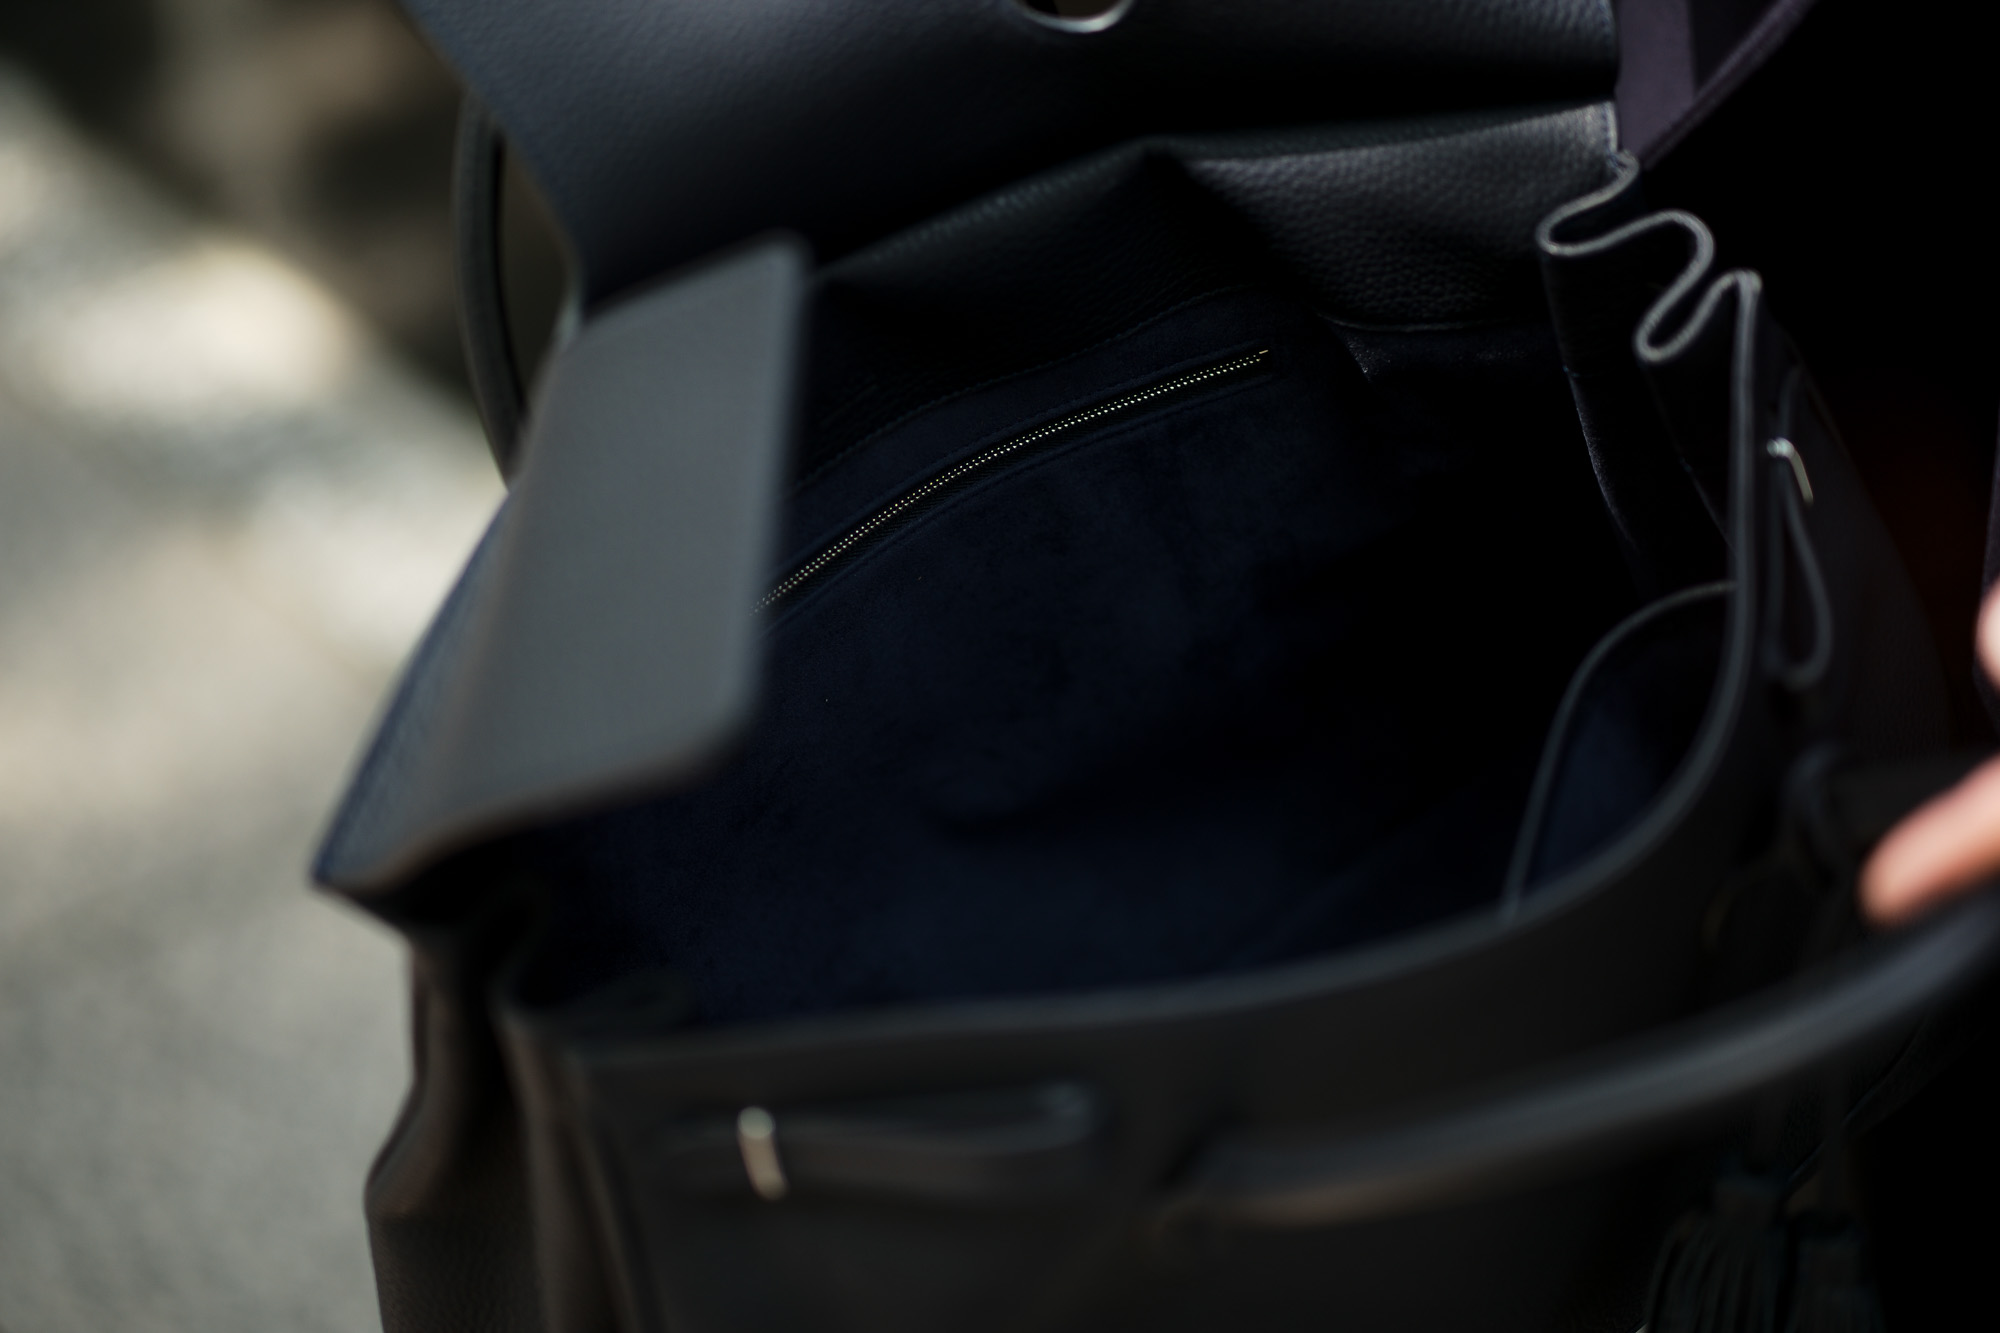 ACATE(アカーテ)OSTRO-M(オストロ-M) Montblanc leather(モンブランレザー) トートバック レザーバック NOTE(ノッテ) MADE IN ITALY(イタリア製) 2019 秋冬新作 愛知 名古屋 altoediritto アルトエデリット トートバック